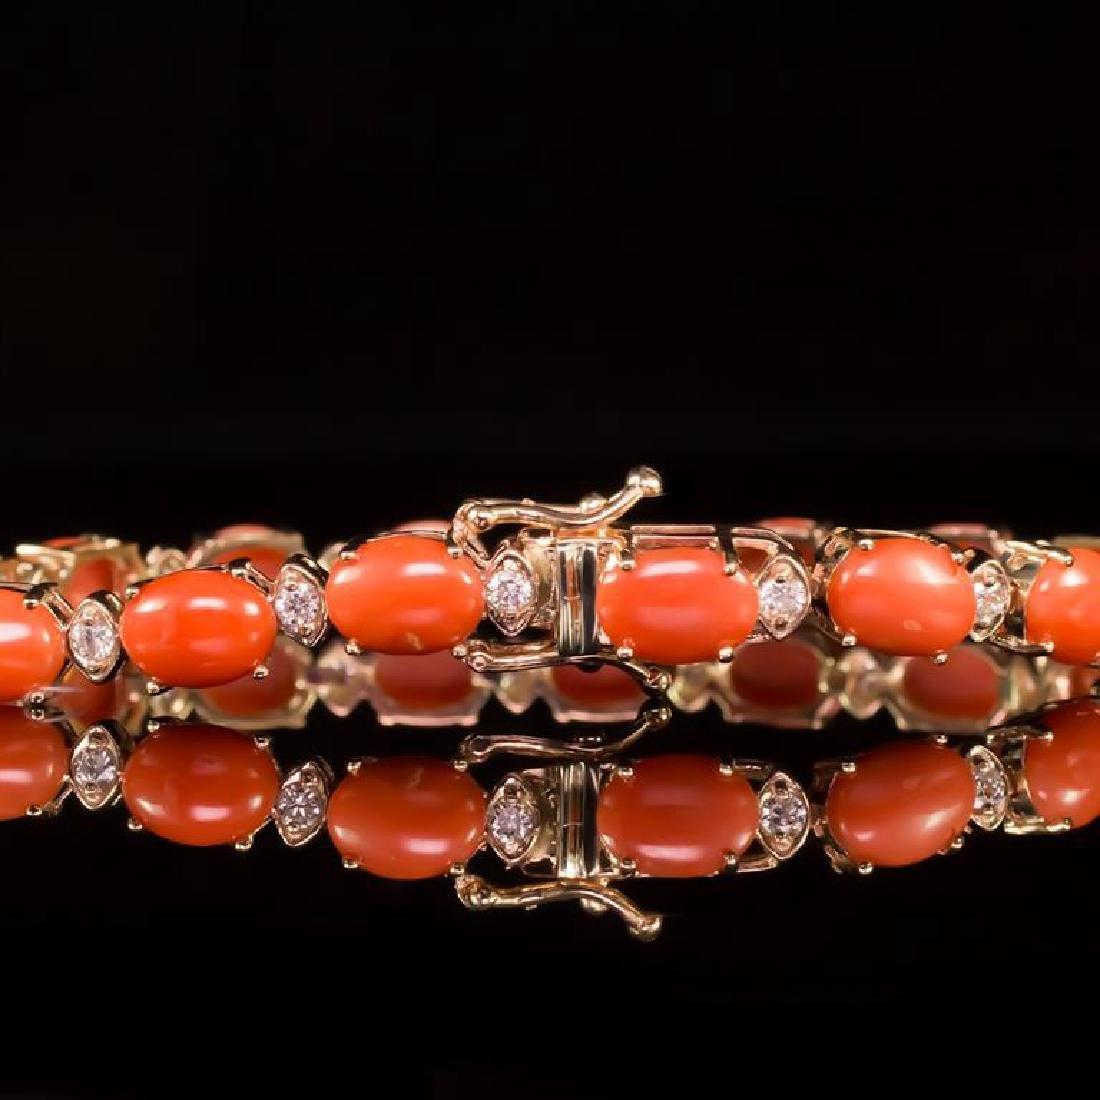 14K Gold 15.68ct Coral 0.80ct Diamond Bracelet - 3